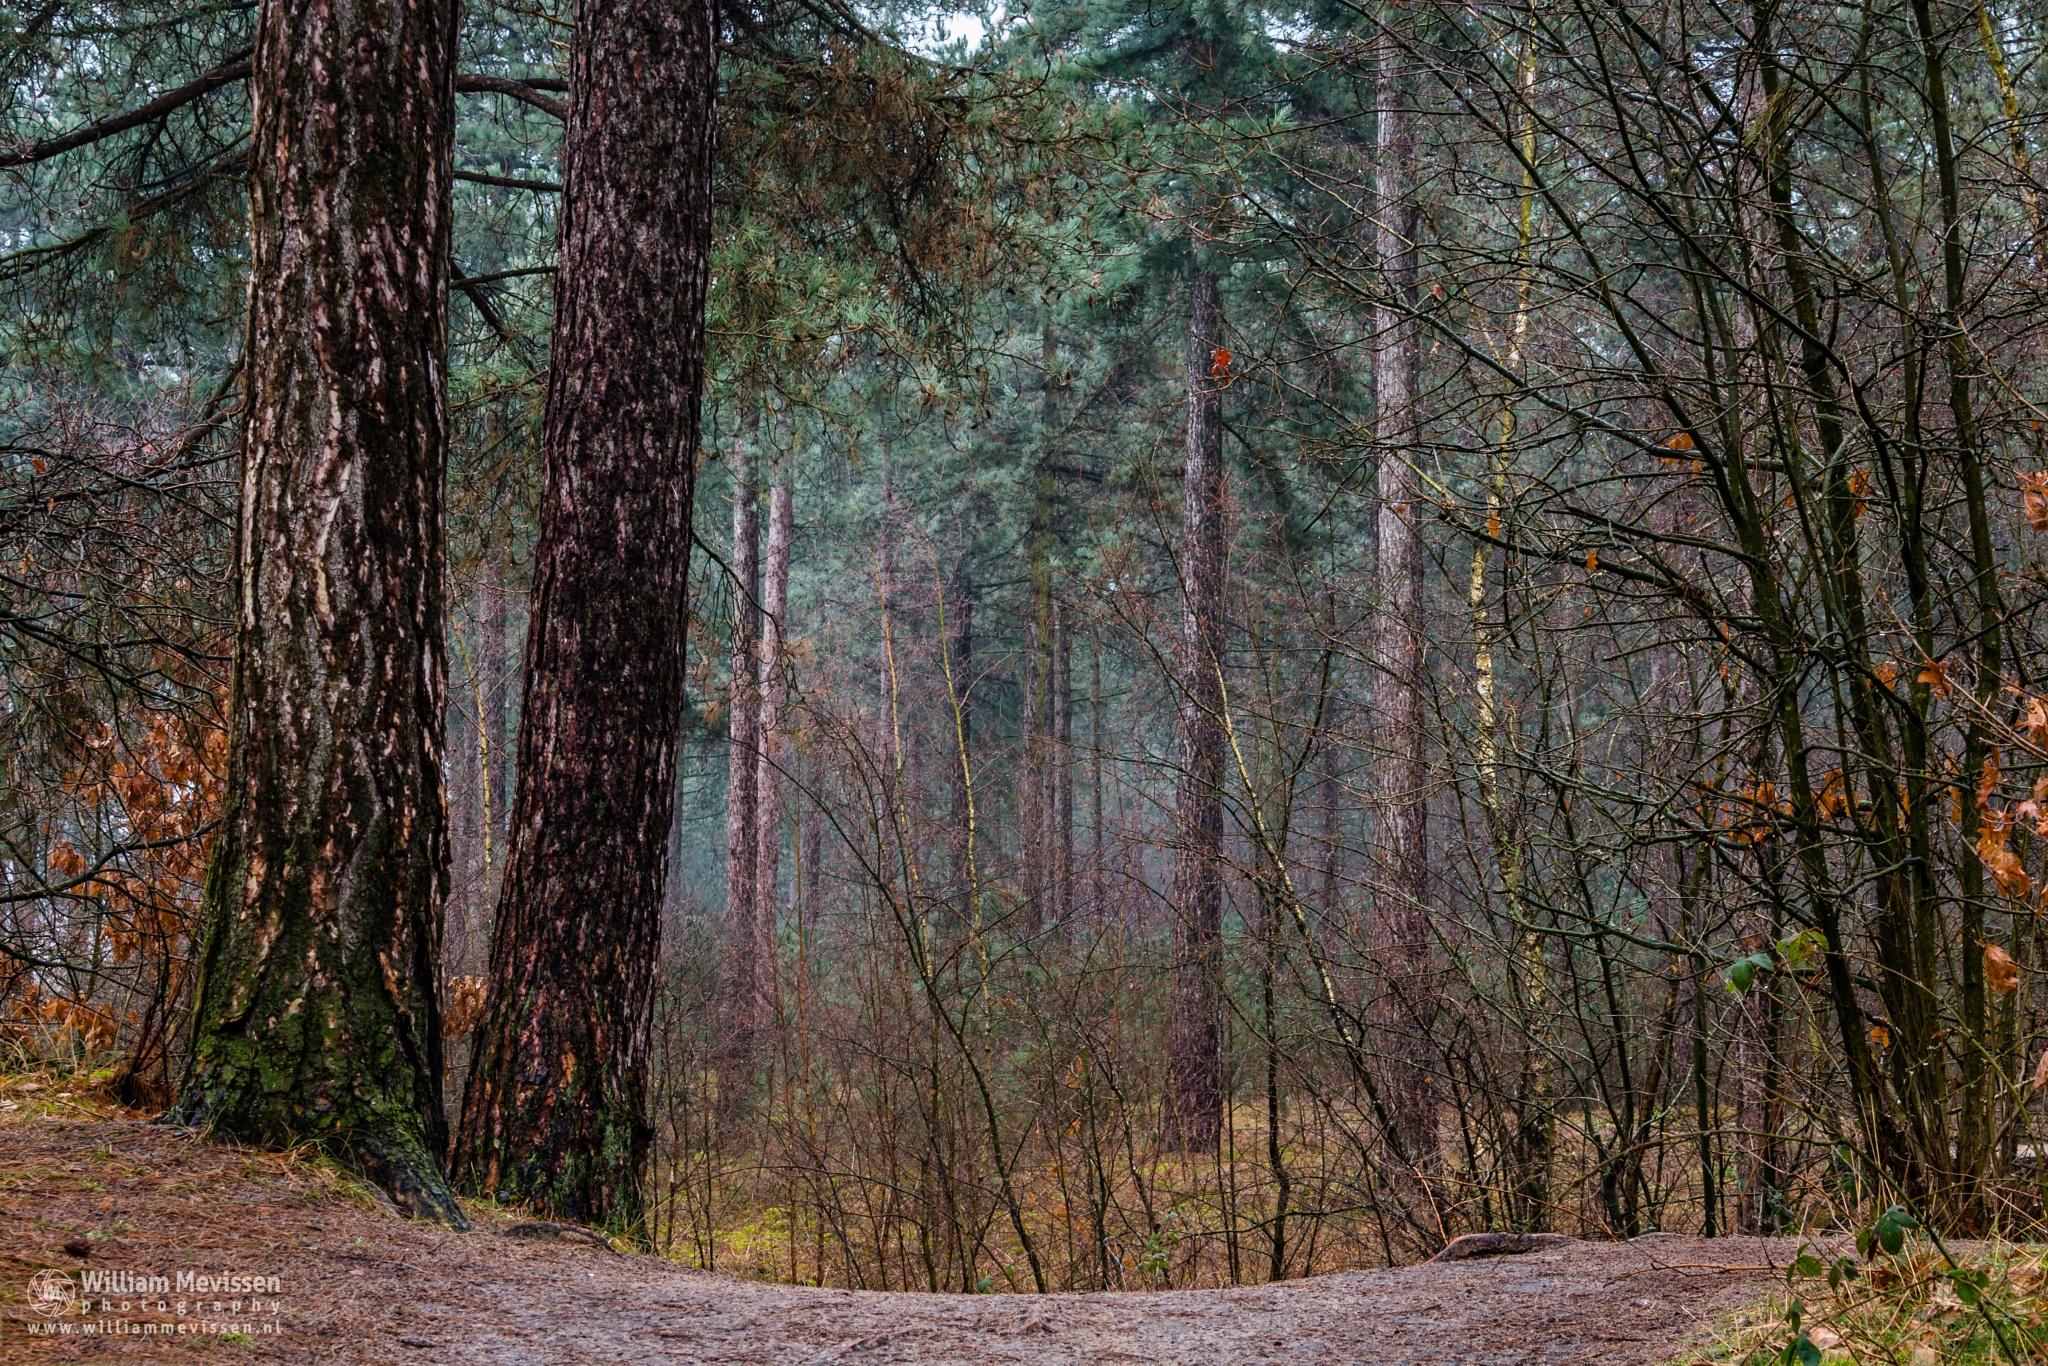 Pine Trees by William Mevissen